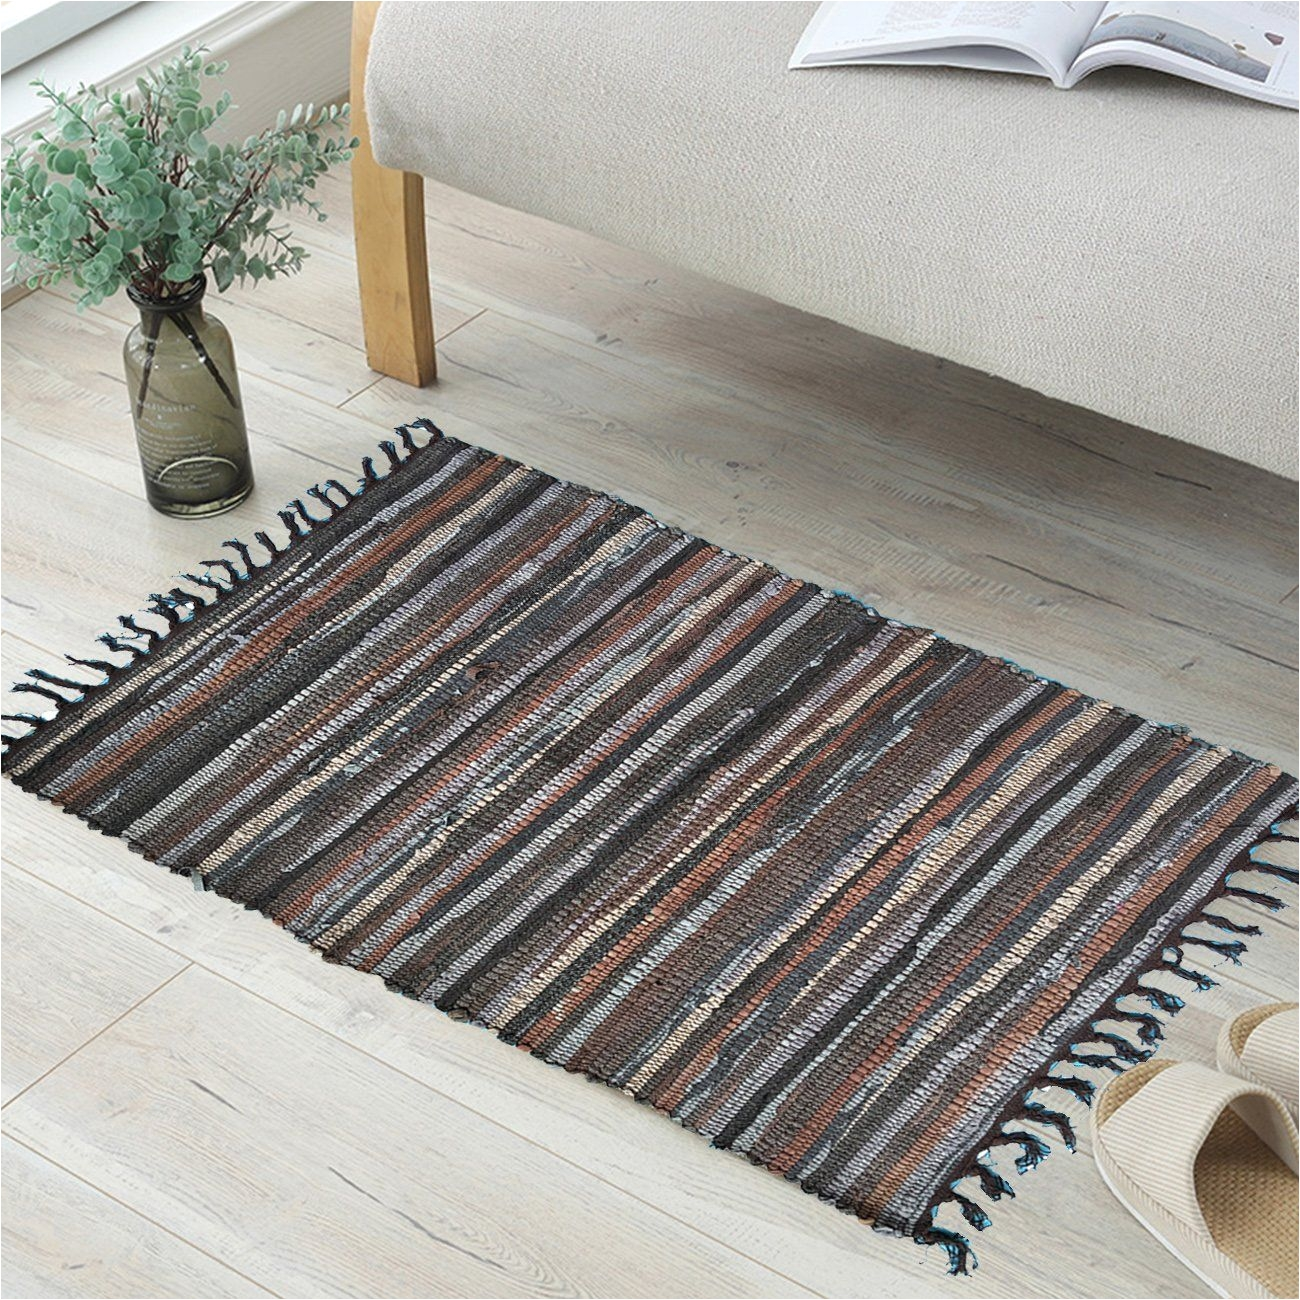 anjuren multifunction reversible durable color stripe area rugs rags hand woven washable runner rug carpet mat